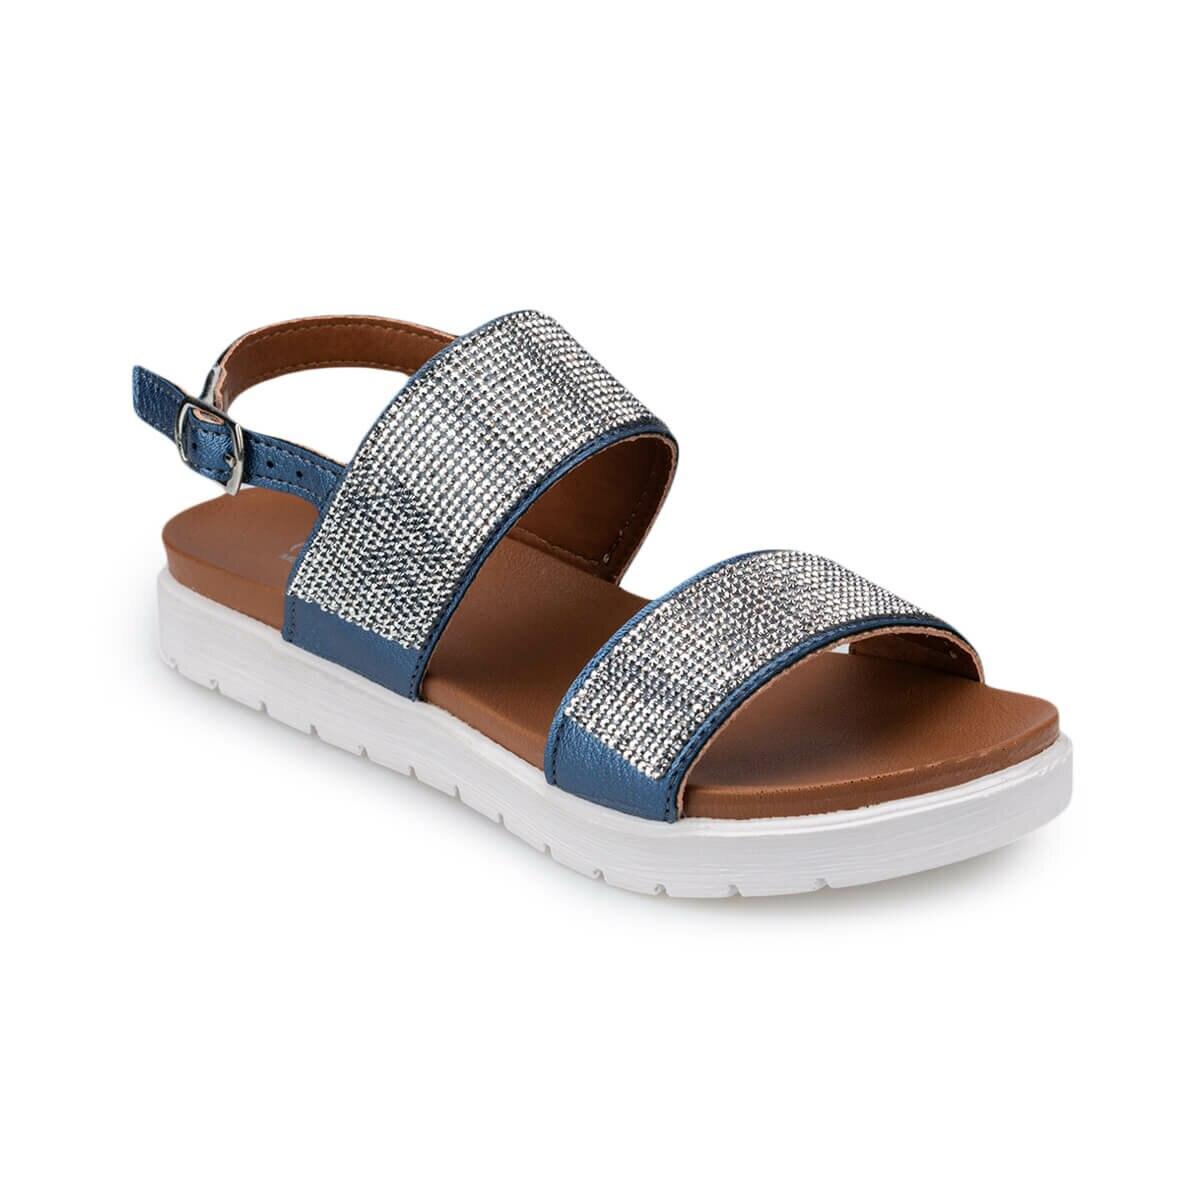 FLO 91.510035.F Navy Blue Female Child Sandals Polaris